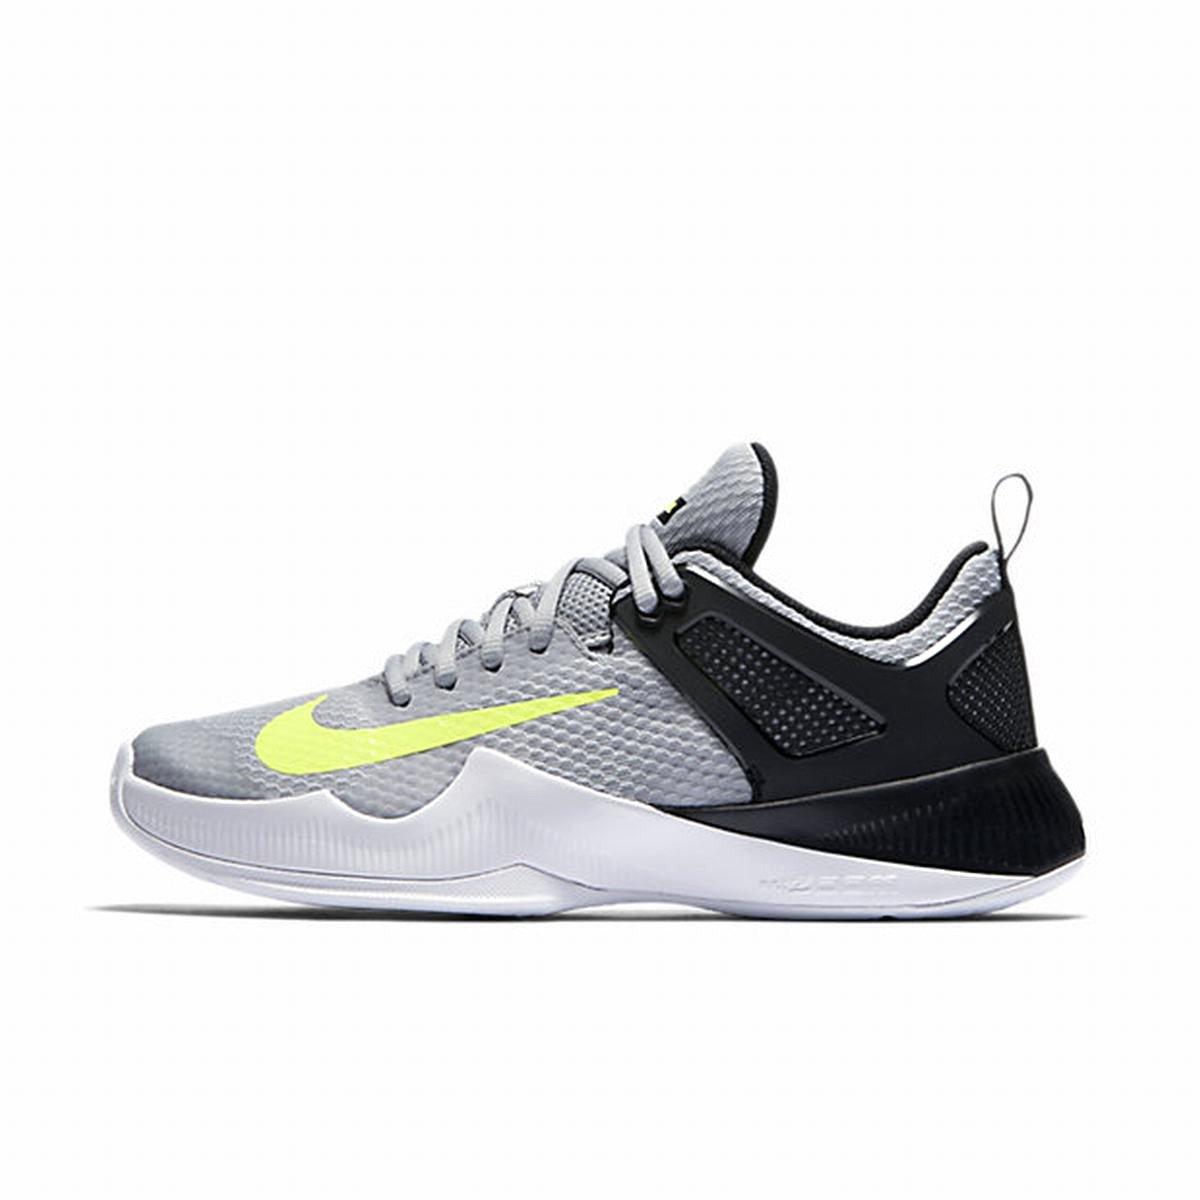 Nike Womens Air Zoom Hyperace Running Shoes ( 9 B(M) US , Wolf Grey / Volt - Black )